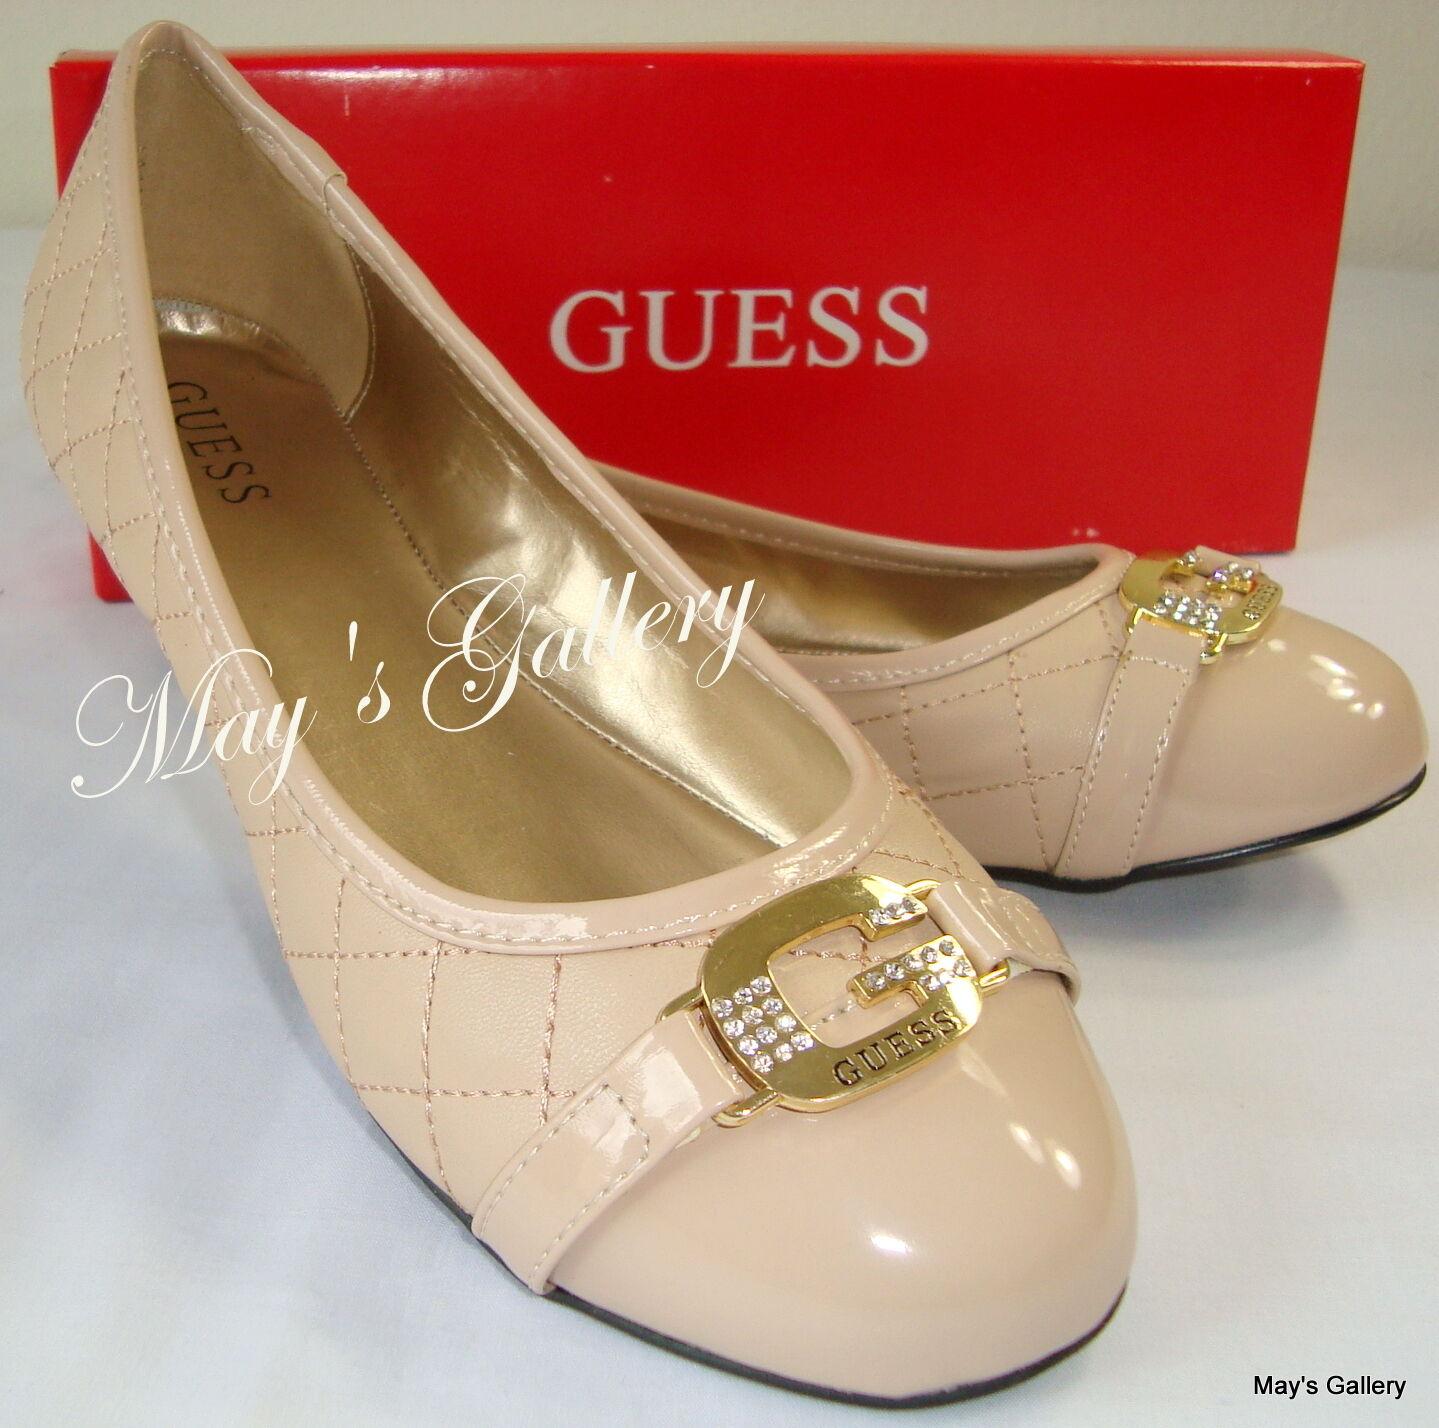 GUESS Jeans Schuhes Flops Flat Flats Heel Flip Flops Schuhes Sandales Flop shoe Ballet NIB 6 f39e5b